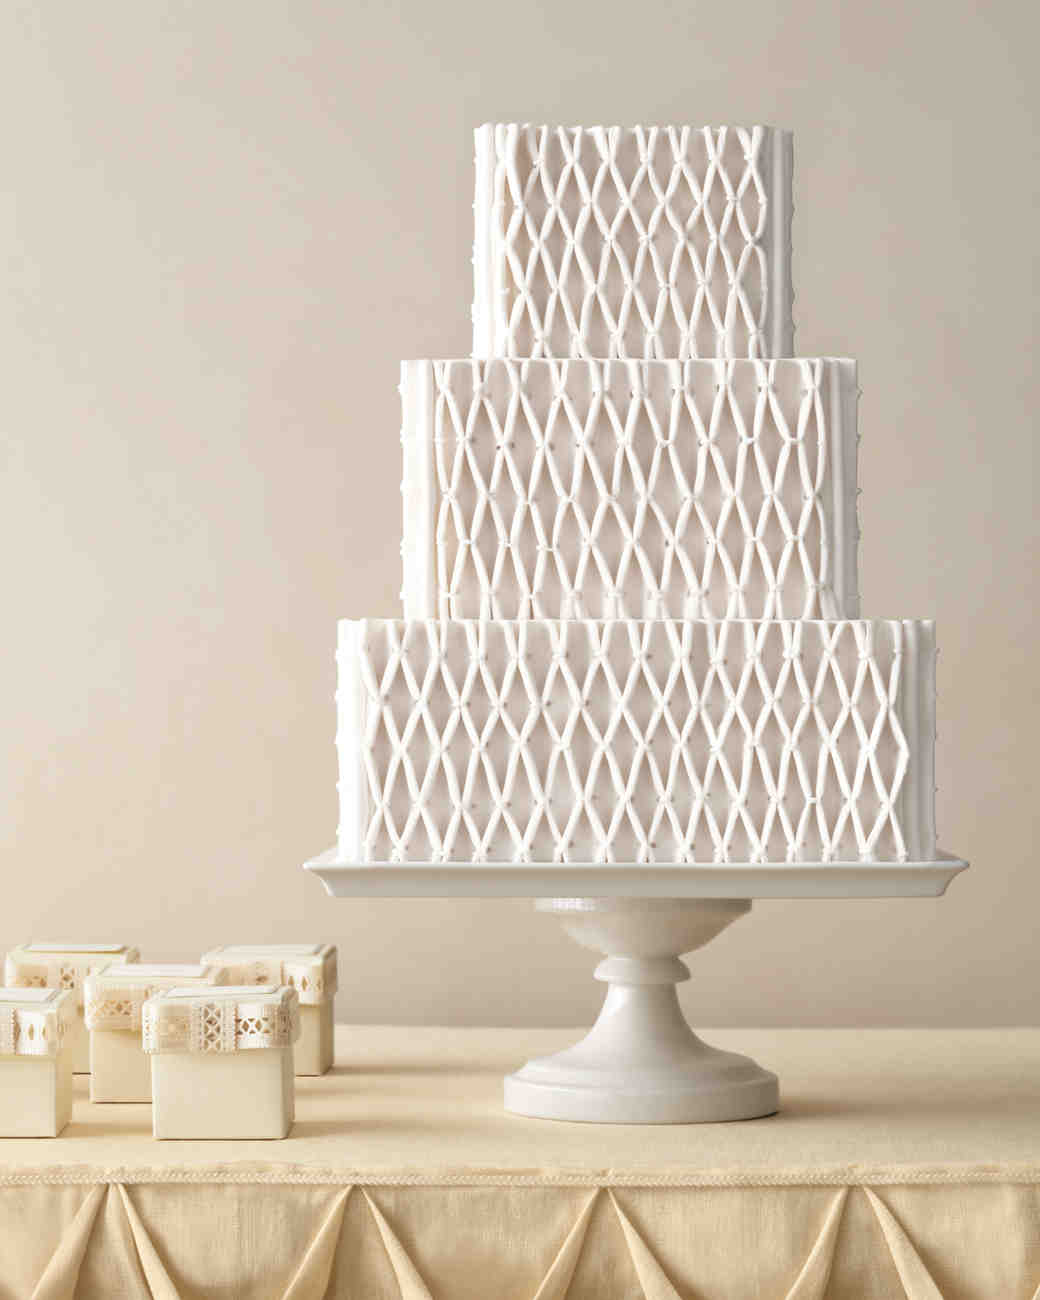 wedding-cakes-06-mwd108904.jpg